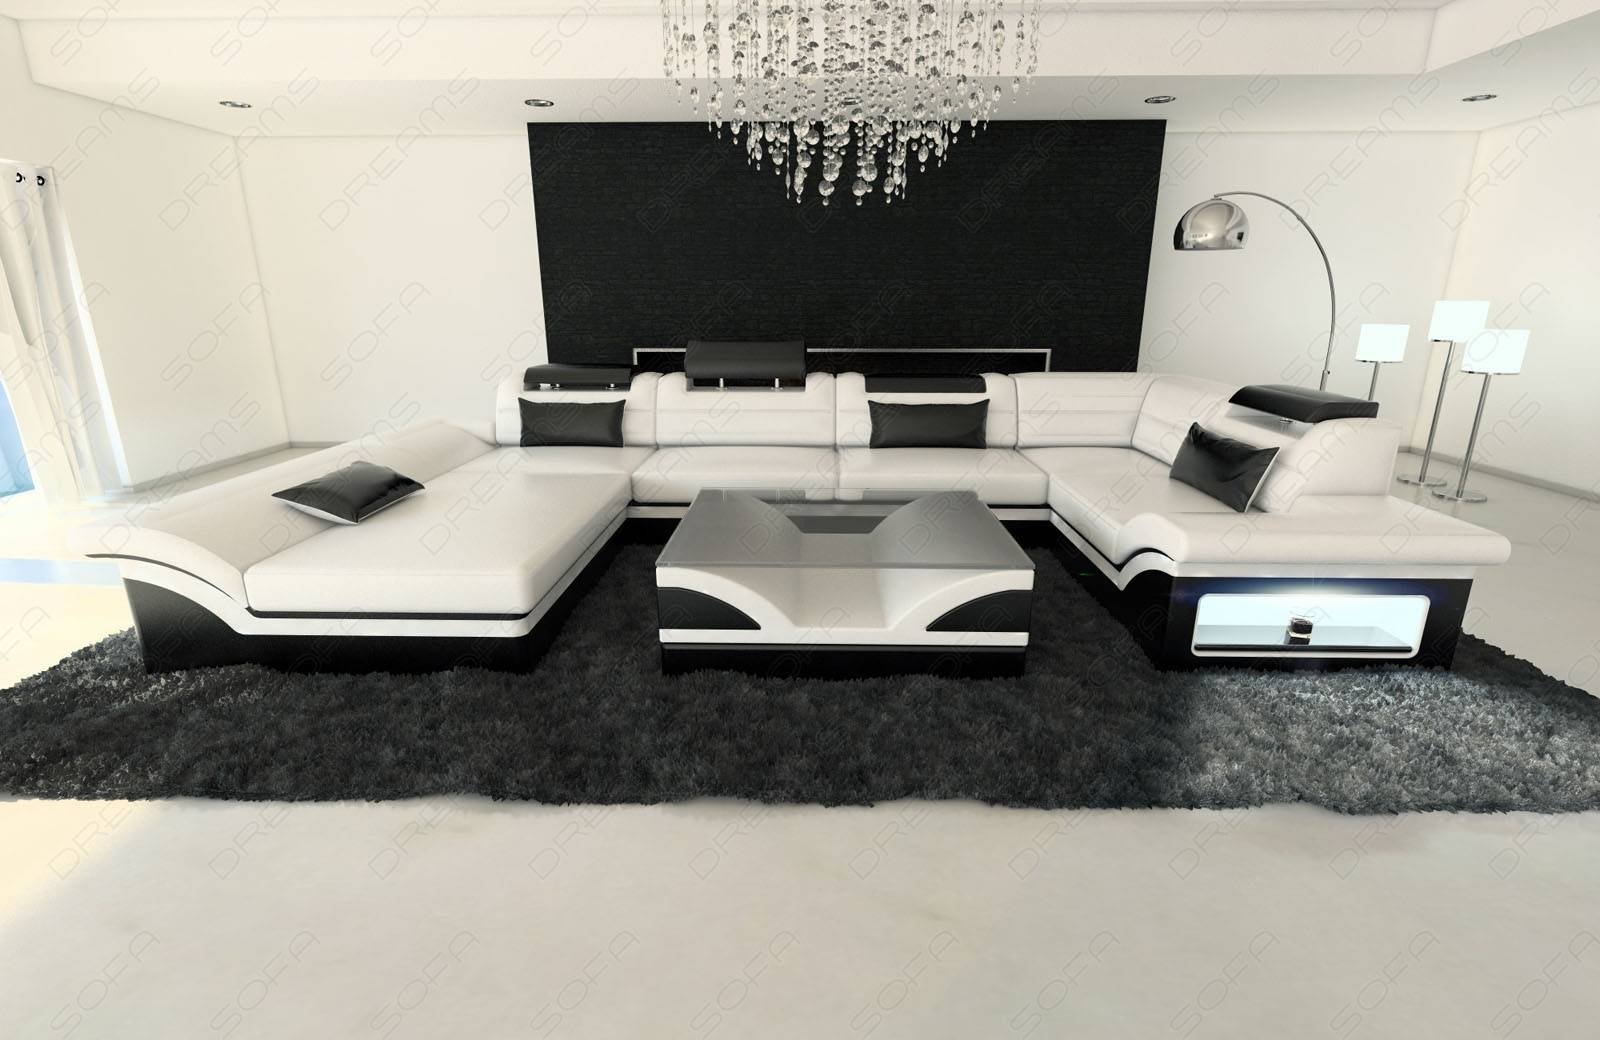 Cheap Leather Sofas. Divani Casa Modern Bonded Leather Sofa Set Inside  Black And White Sofas